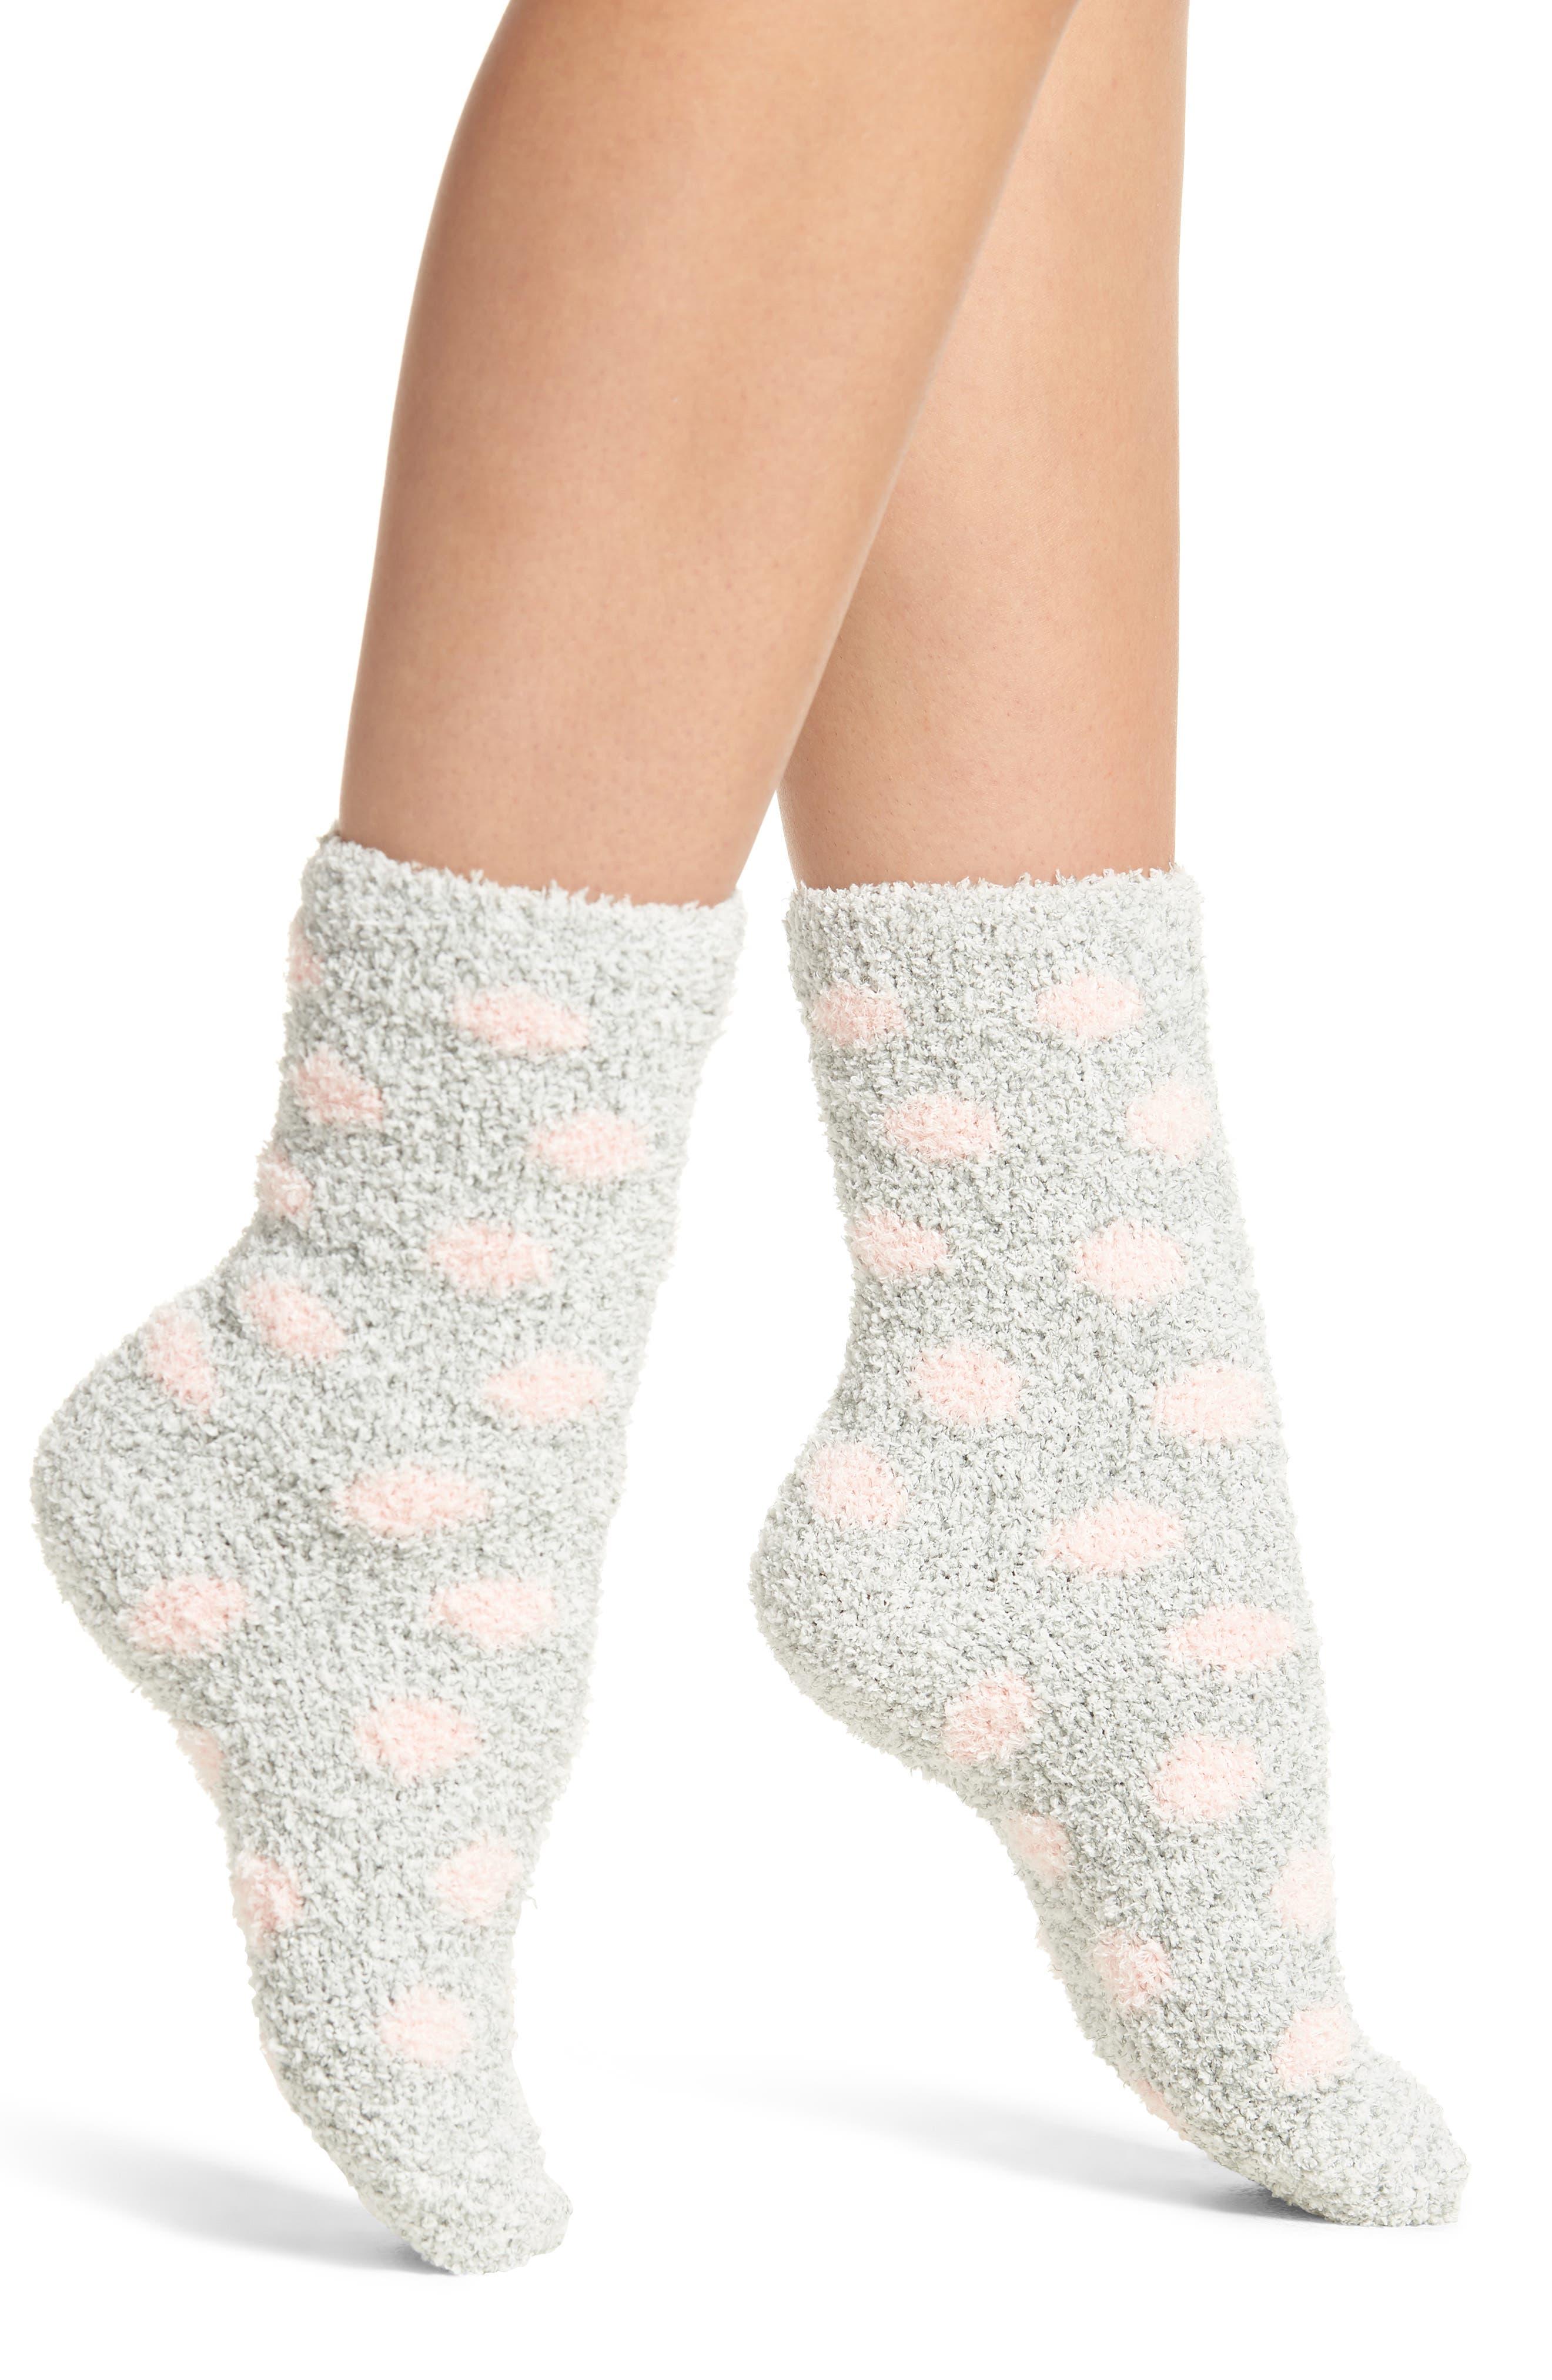 Butter Pattern Crew Socks,                             Main thumbnail 1, color,                             GREY W/ LIGHT PINK DOTS